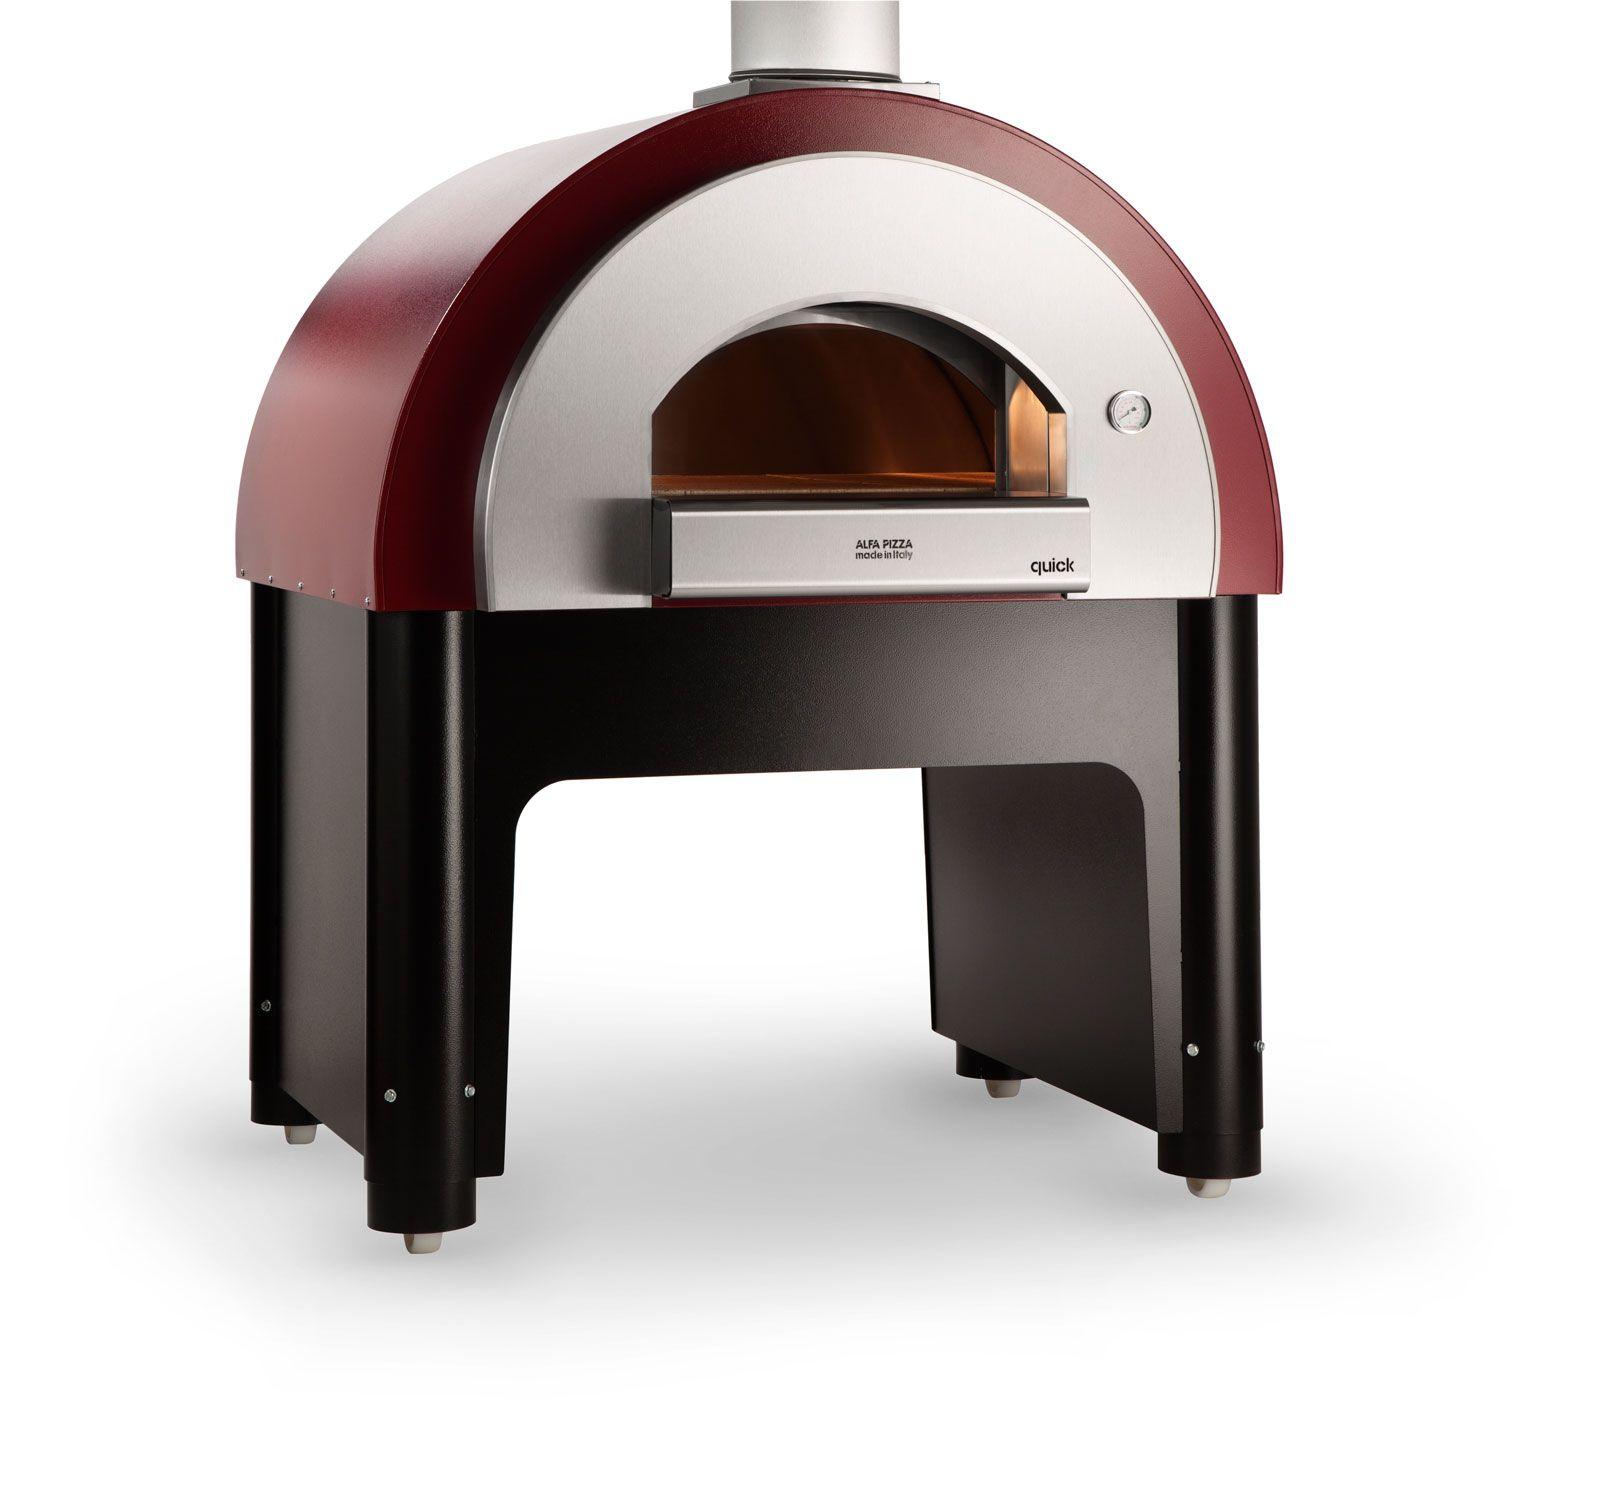 Alfa Pizza Quick Pro Pizza Oven Commercial Pizza Oven Outdoor